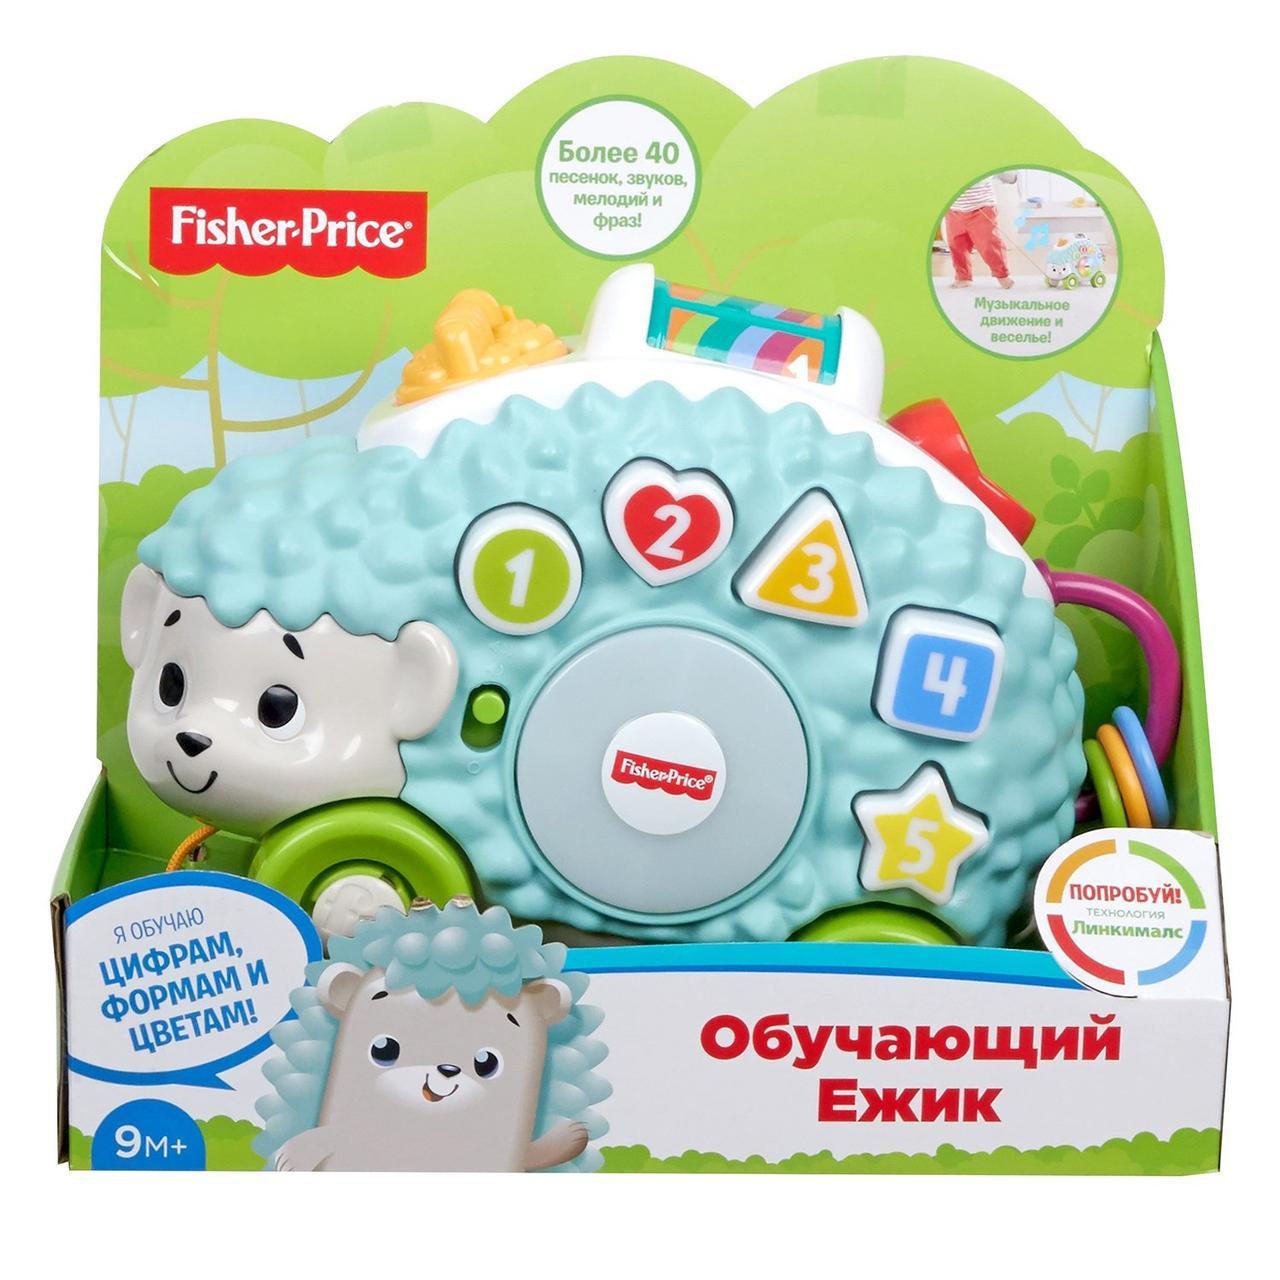 "Fisher-price Музыкальная обучающая игрушка ""Ёжик"" (свет, звук)"